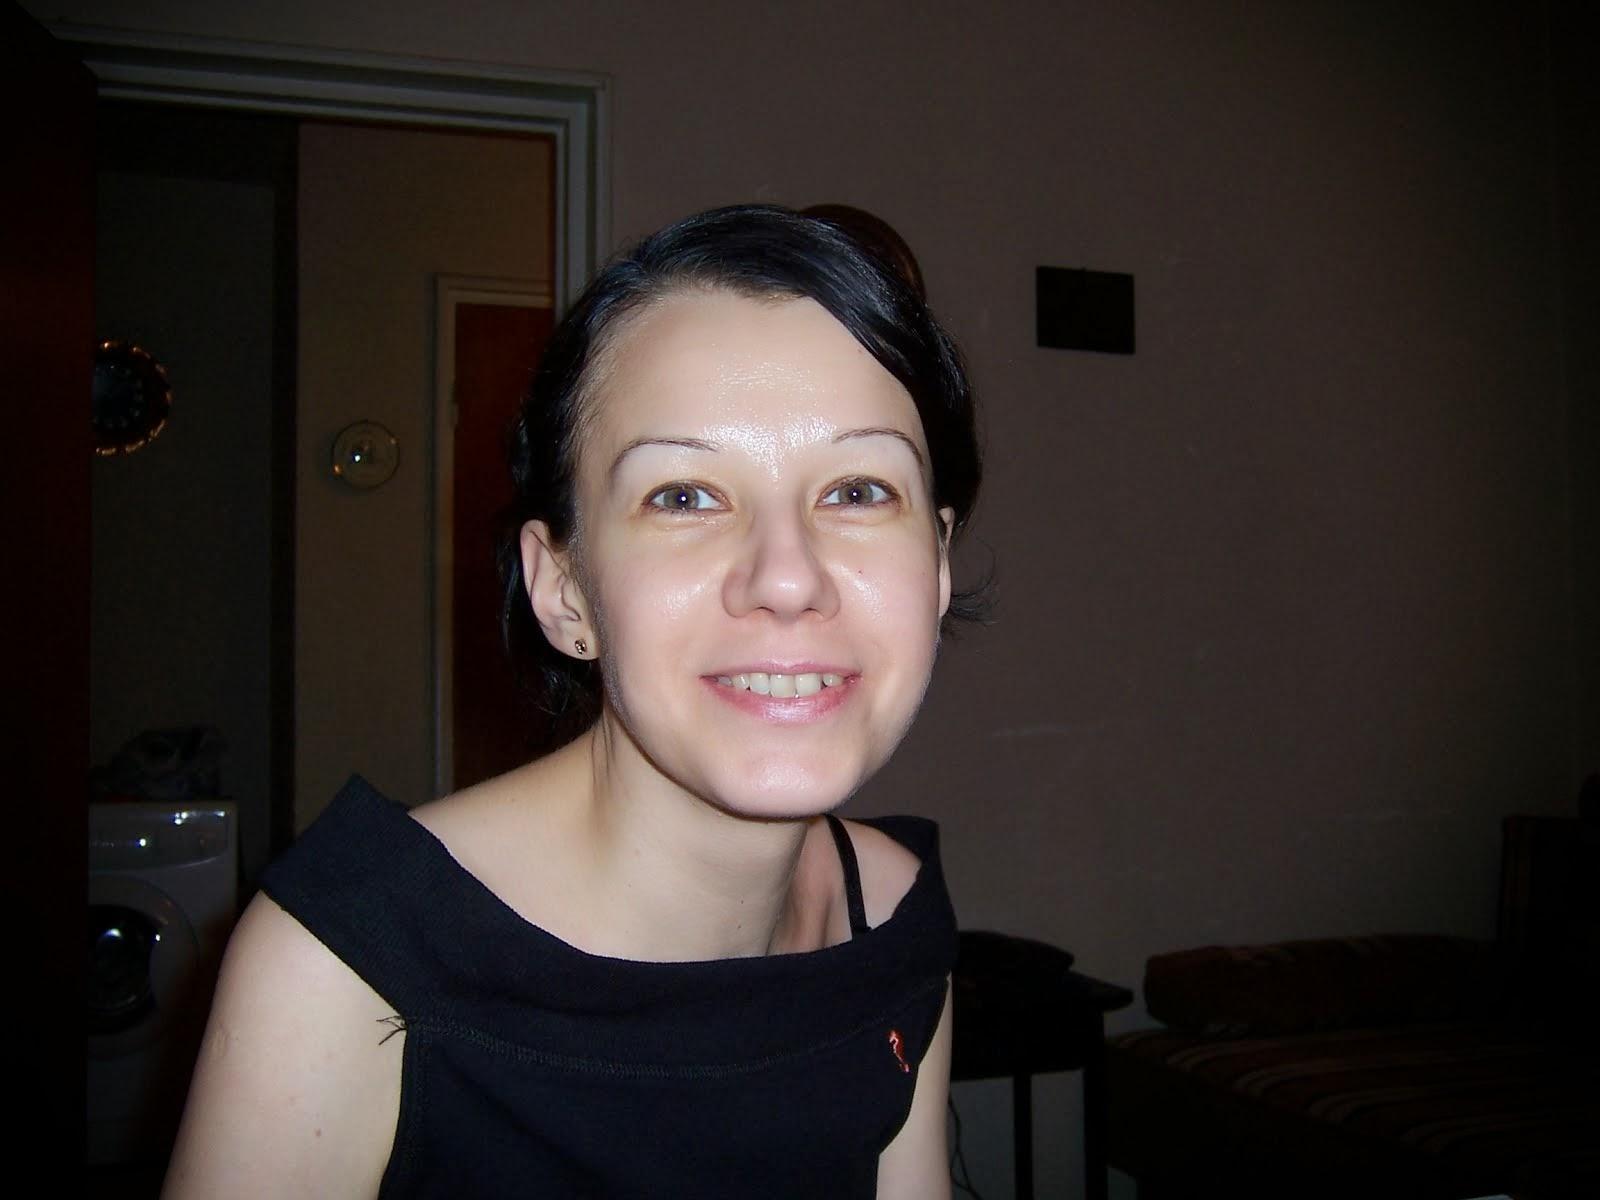 Olivia Maria N. Marcov, august 2006, Bucuresti